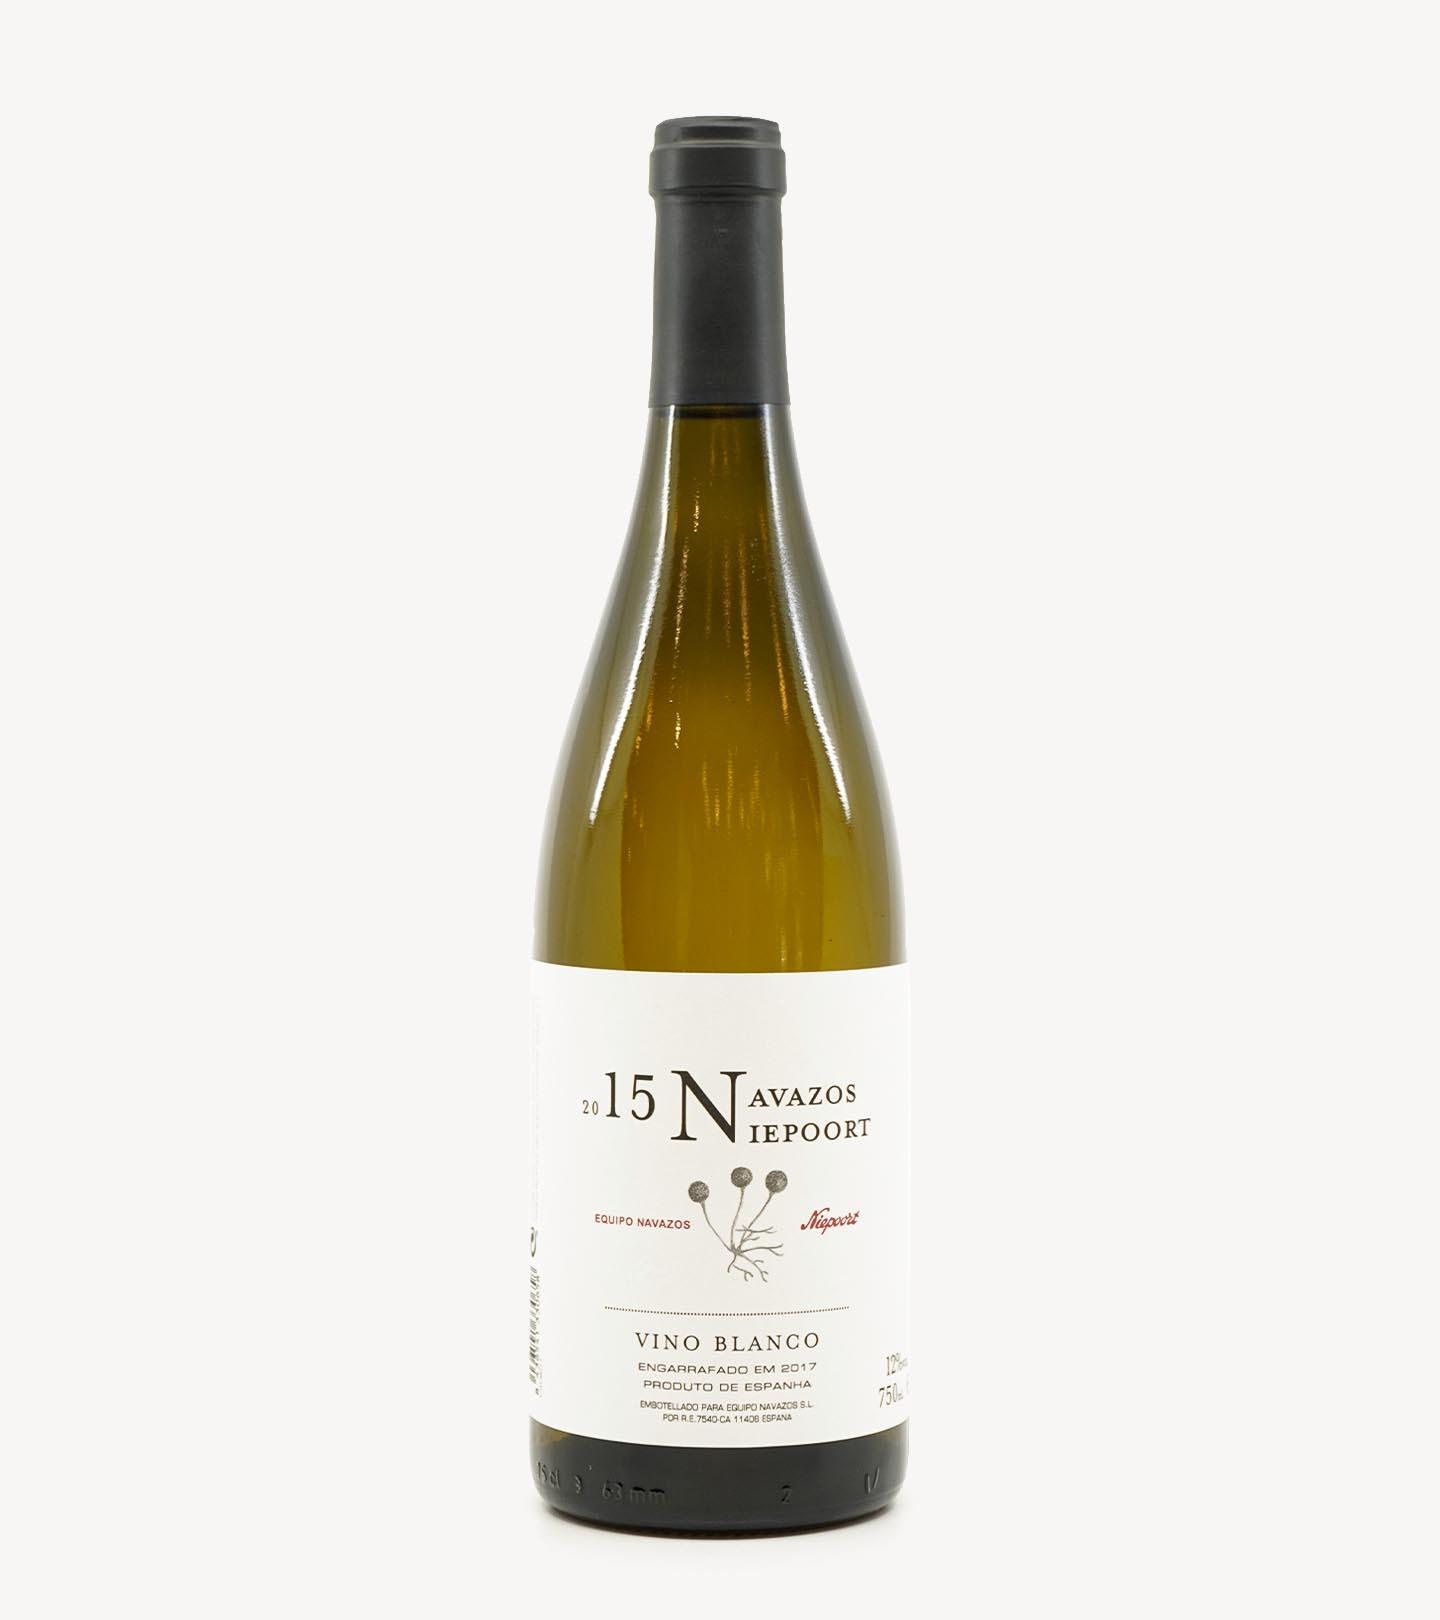 Vinho Branco Espanhol Equipo Navazos Niepoort 75cl